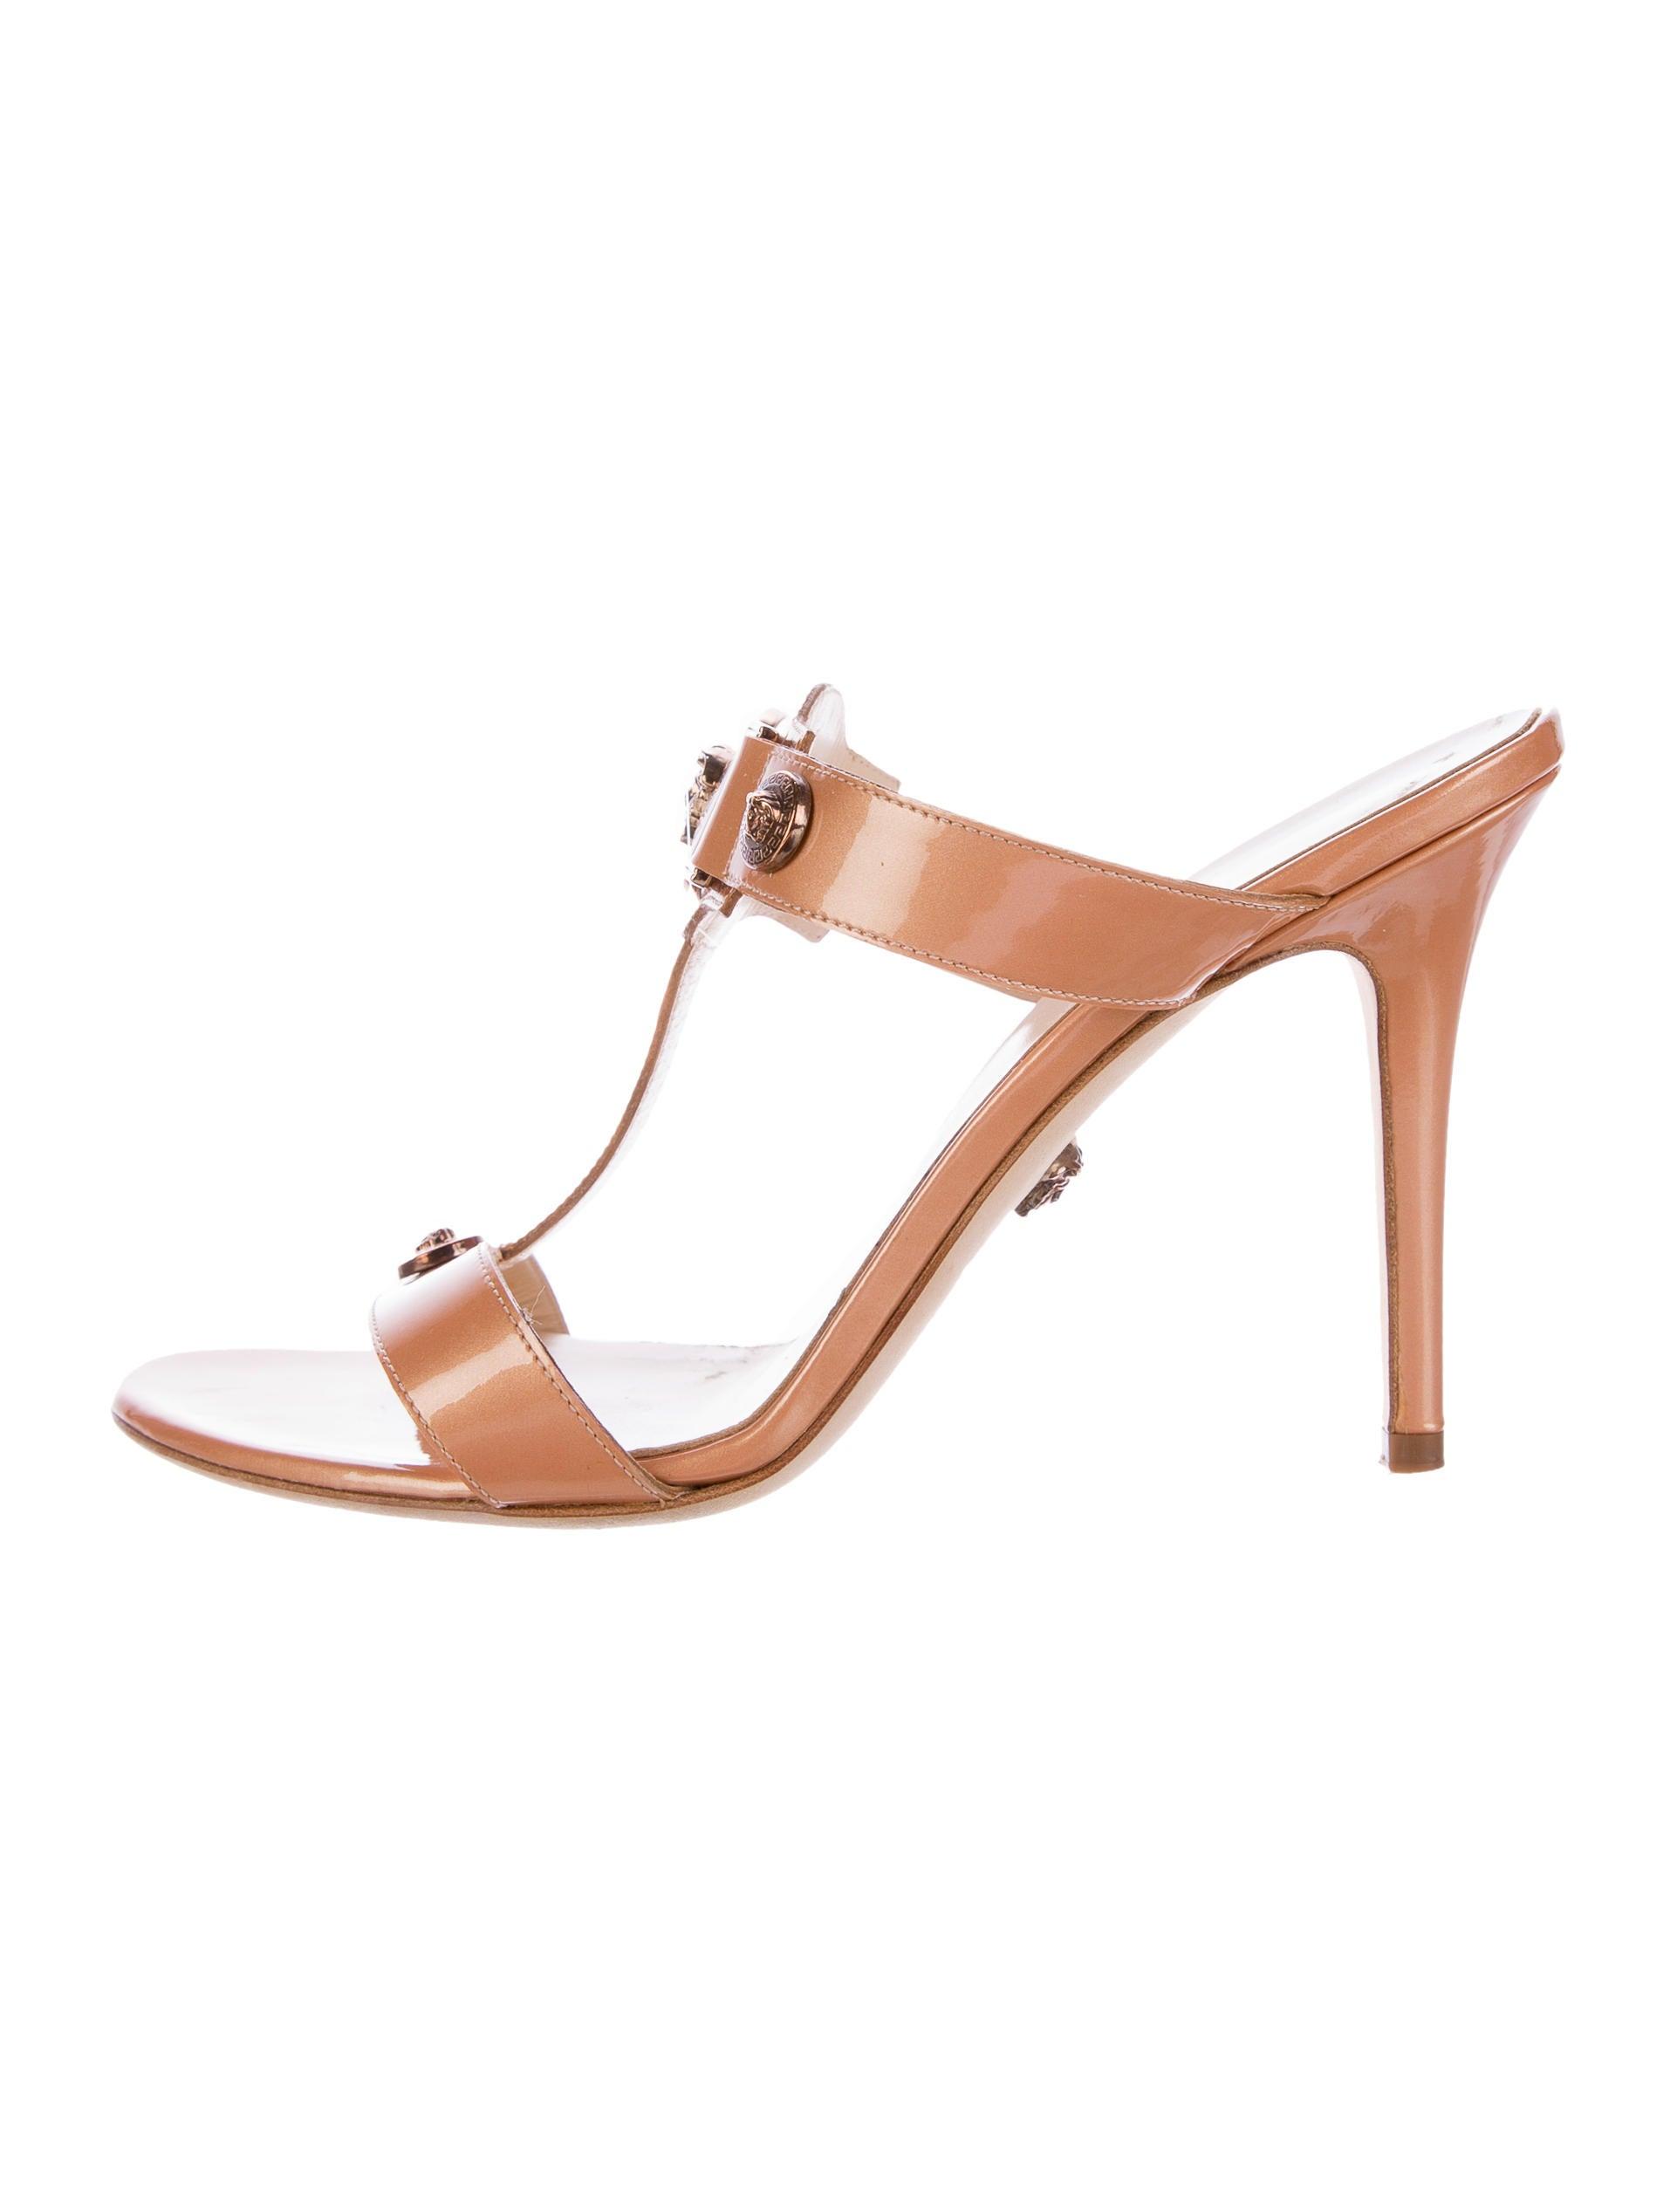 Versace Logo Slide Sandals - Shoes - VES29198 | The RealReal